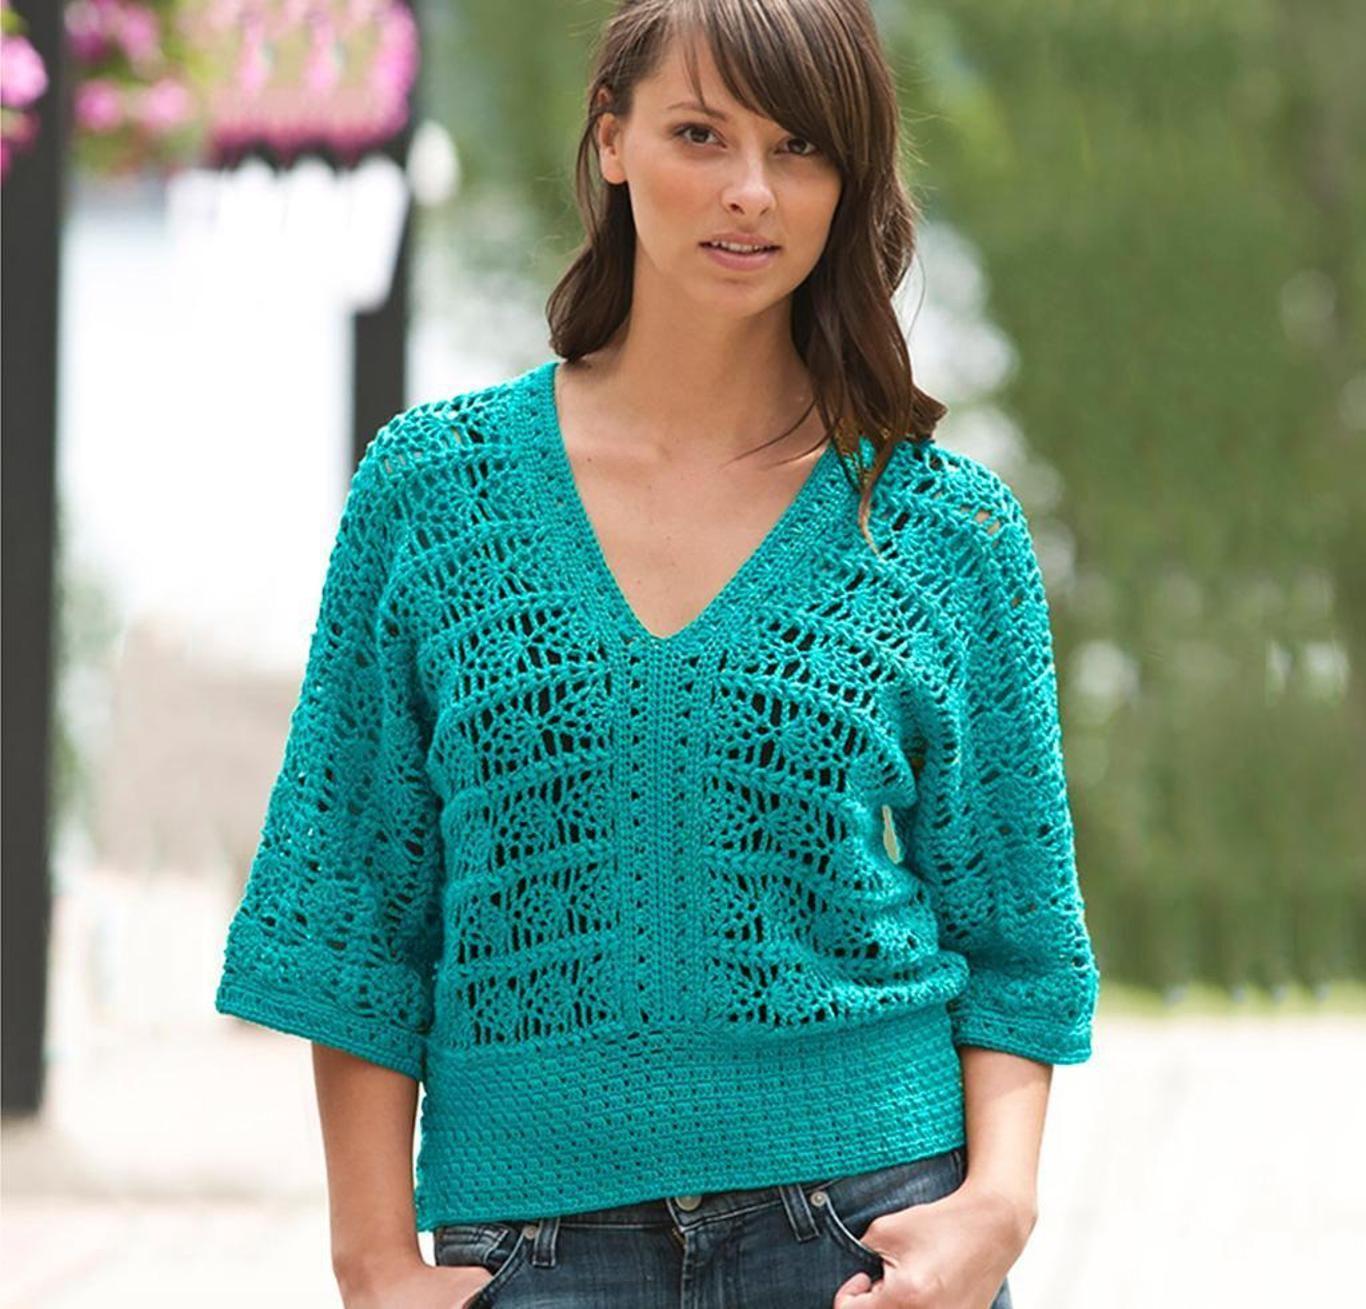 Pineapple Top Sweater Crochet Kit | Crochet and Knitting Patterns ...